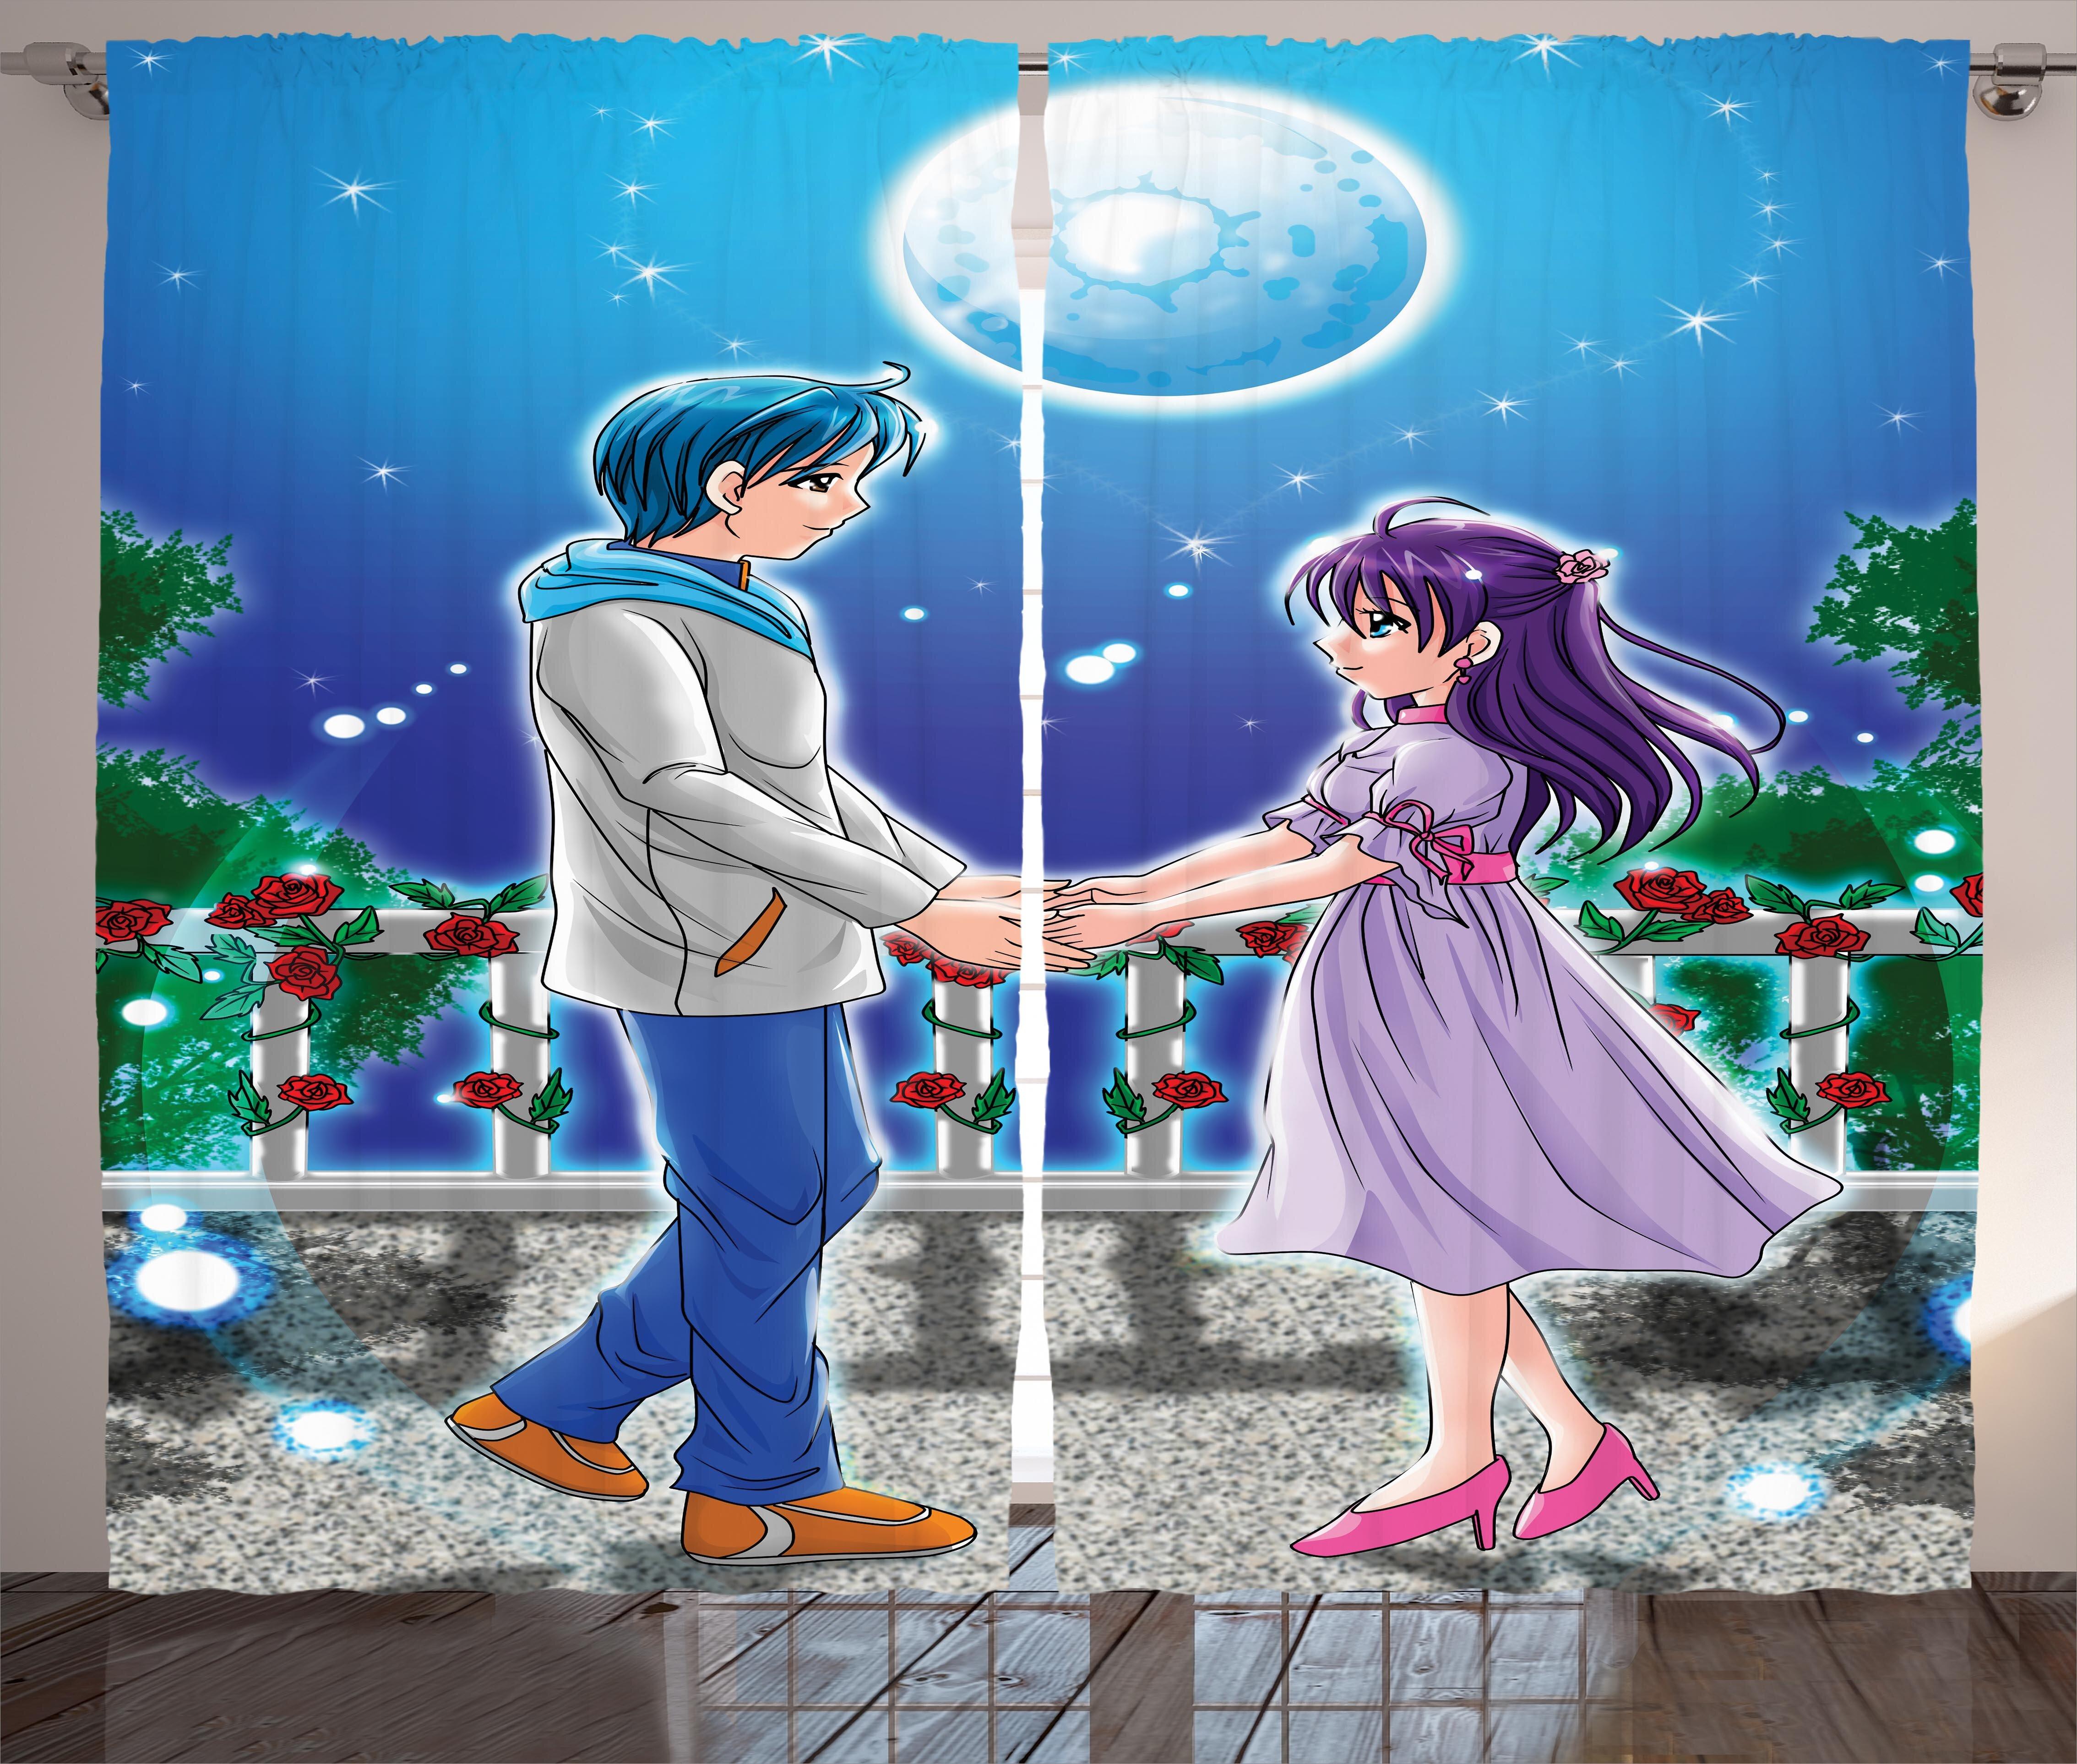 East Urban Home Anime Illustration Of Romantic Couple Holding Hands Under Moonlight Love In Manga Themed Print Graphic Print Text Semi Sheer Rod Pocket Curtain Panels Wayfair